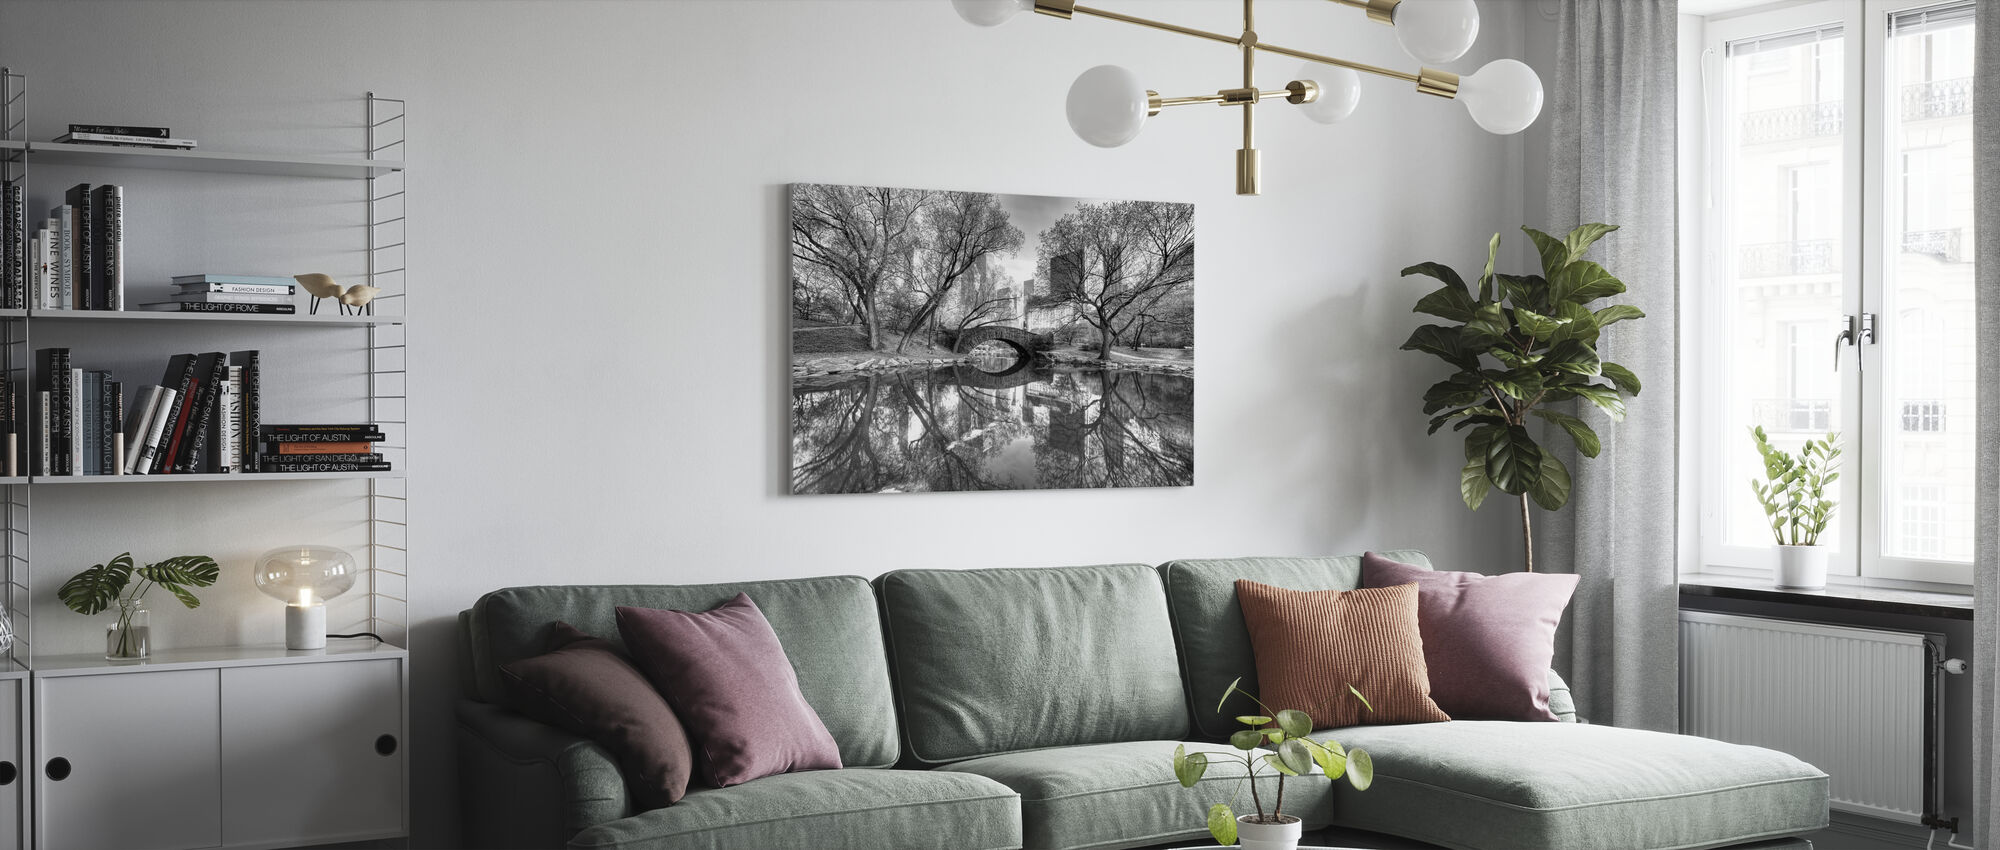 Bridge in Central Park - Canvas print - Living Room